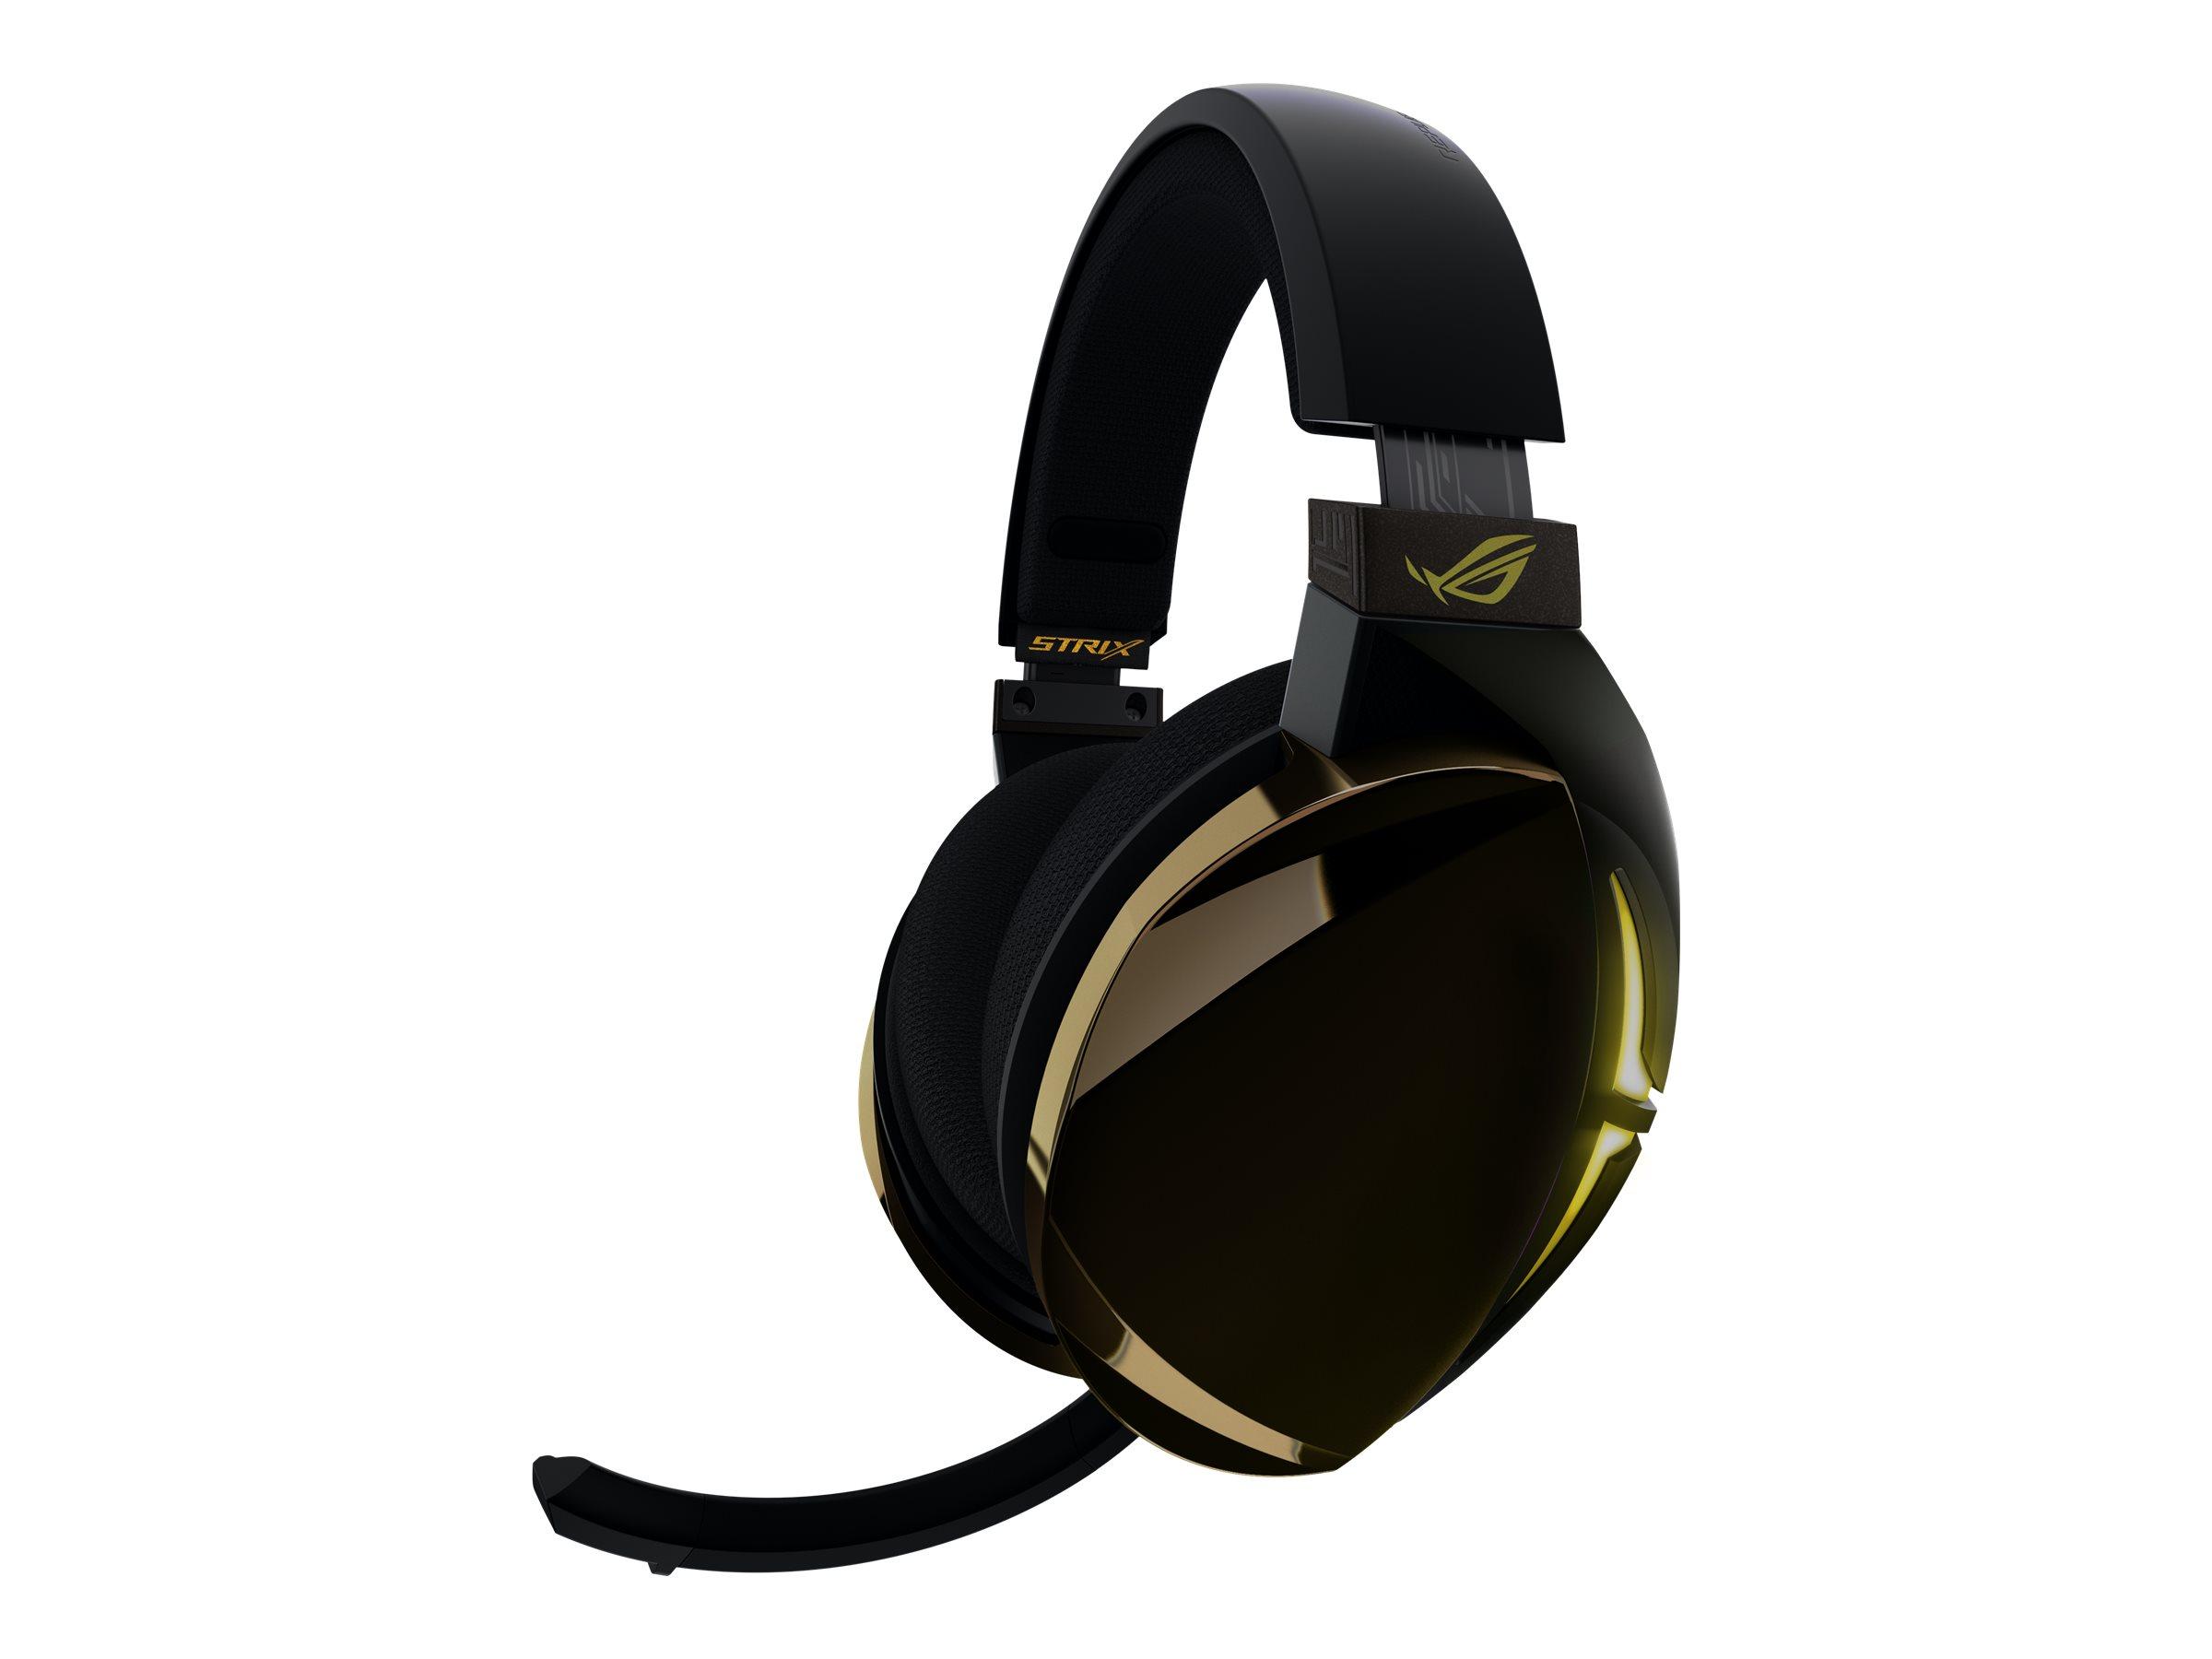 ASUS ROG Strix Fusion 700 - Headset - ohrumschliessend - Bluetooth - kabellos